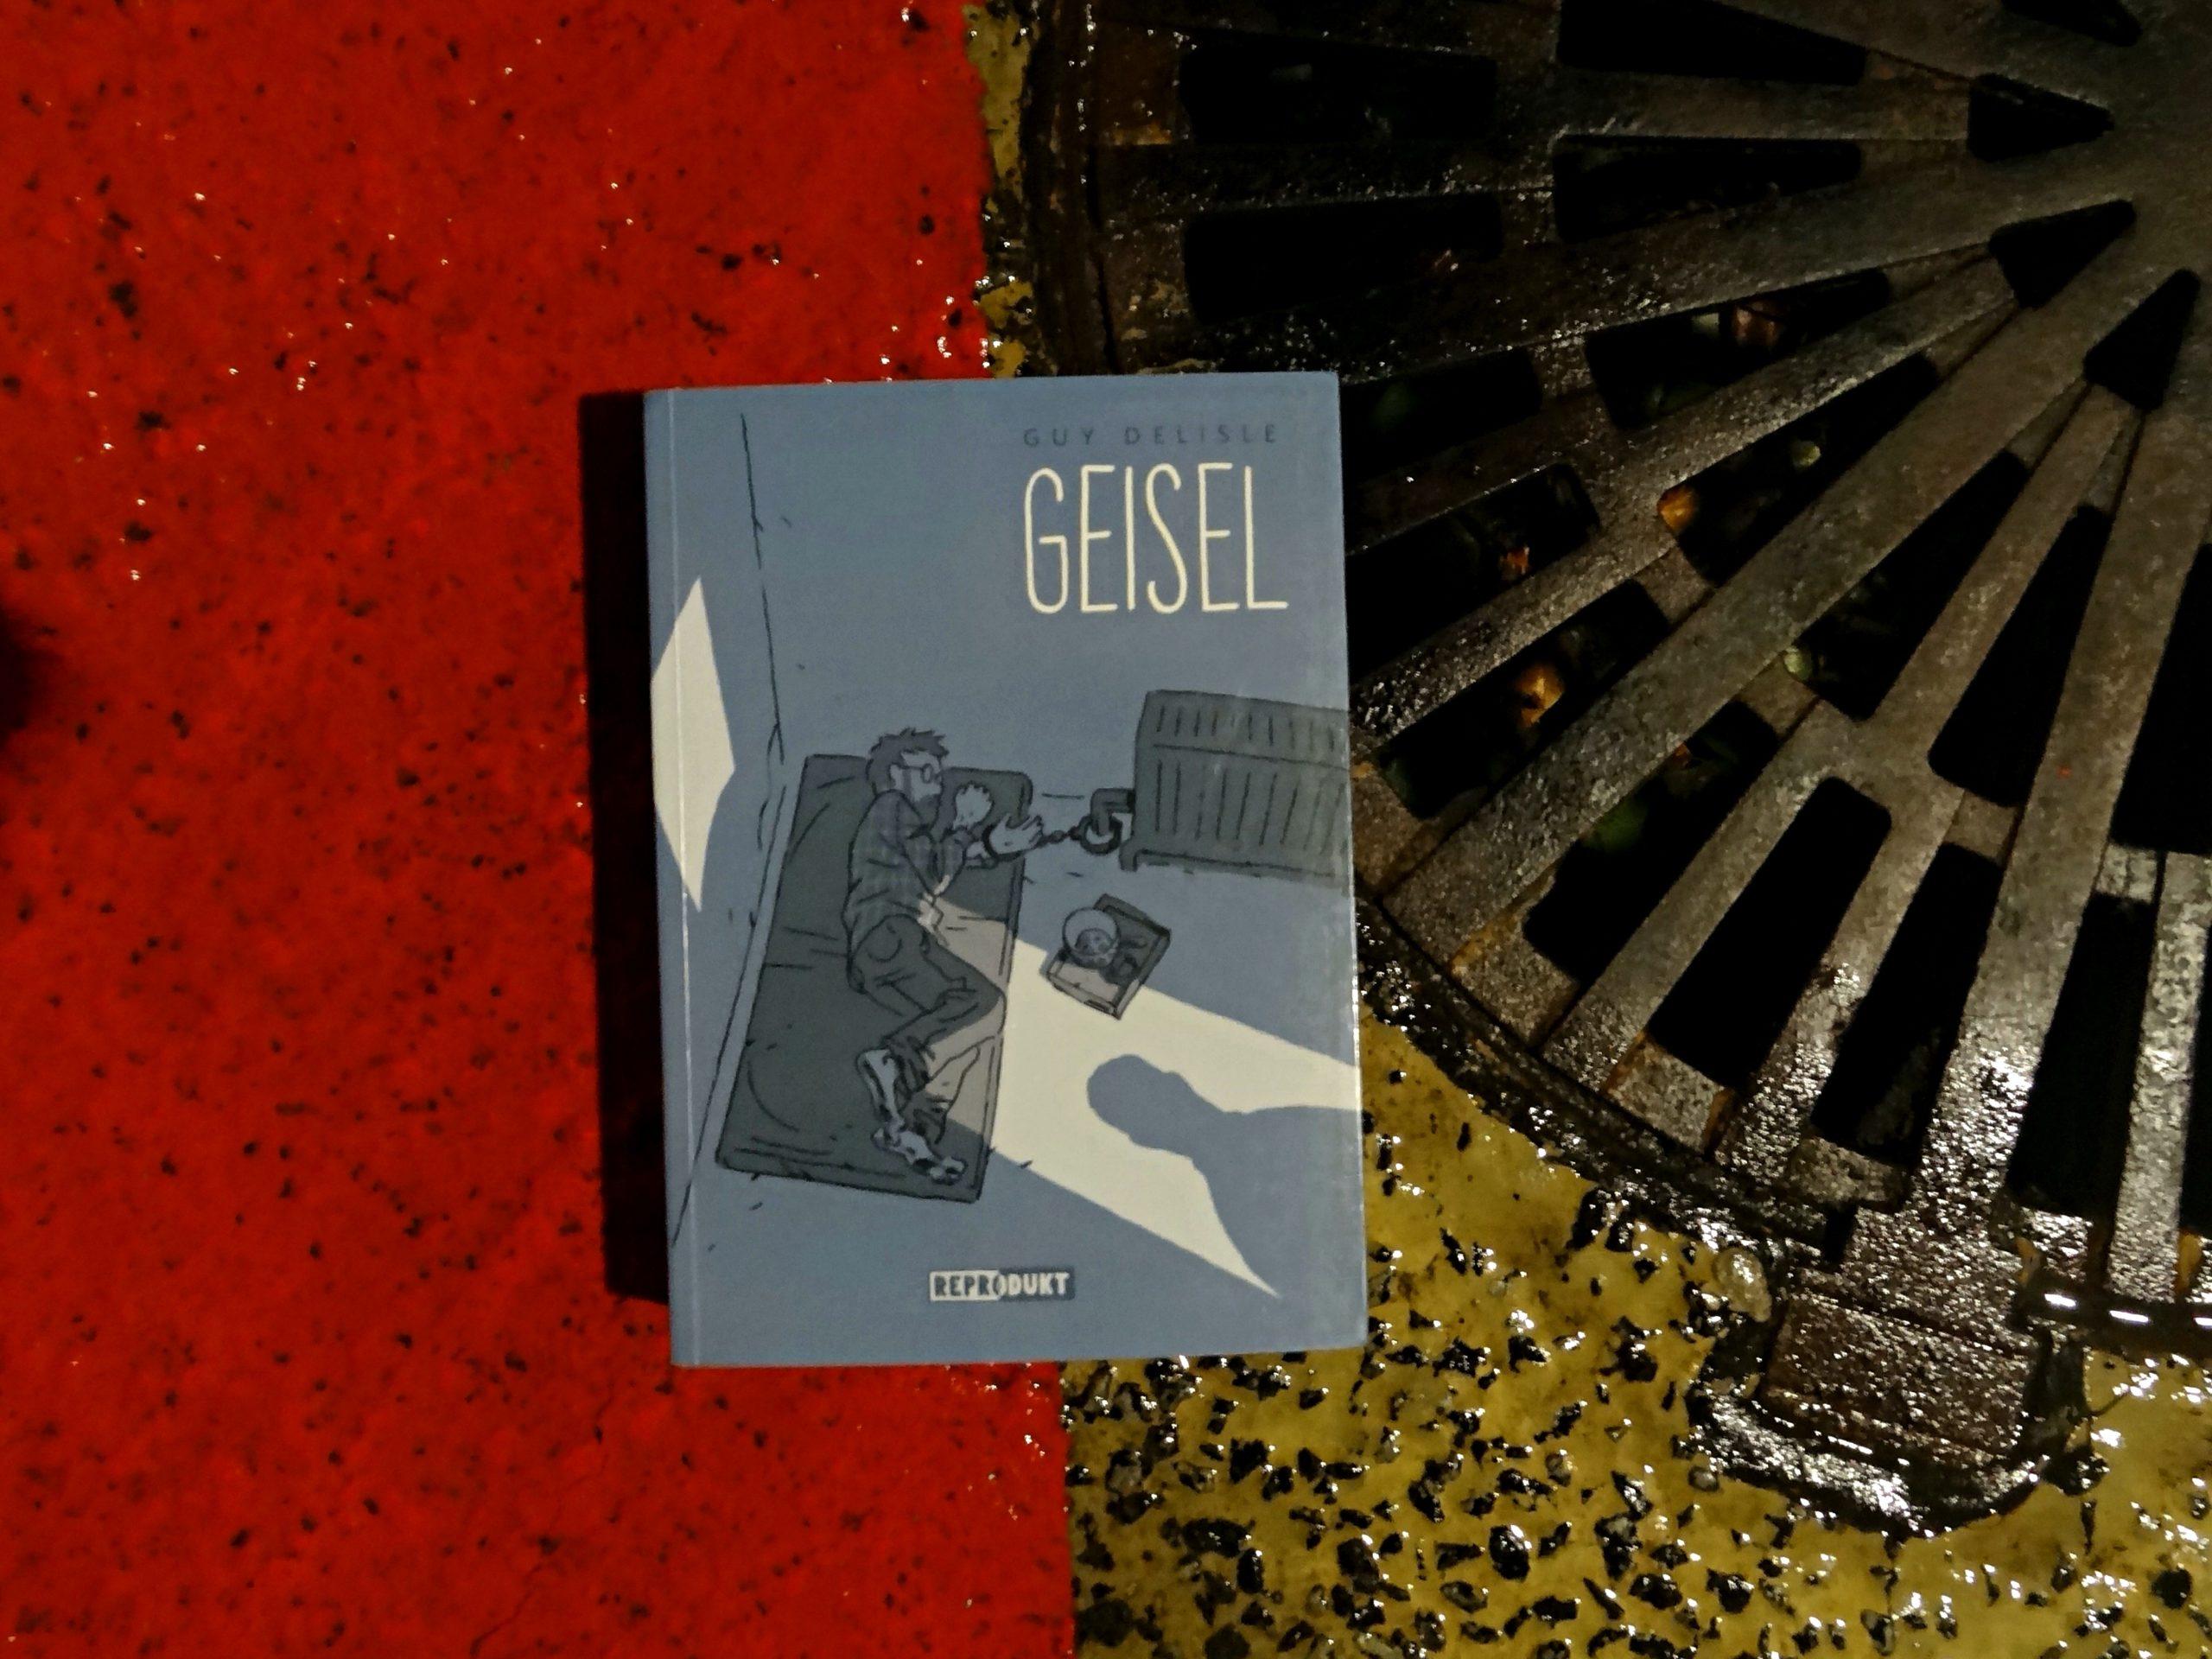 Tino Schlench - Literaturpalast - Guy Delisle - Geisel